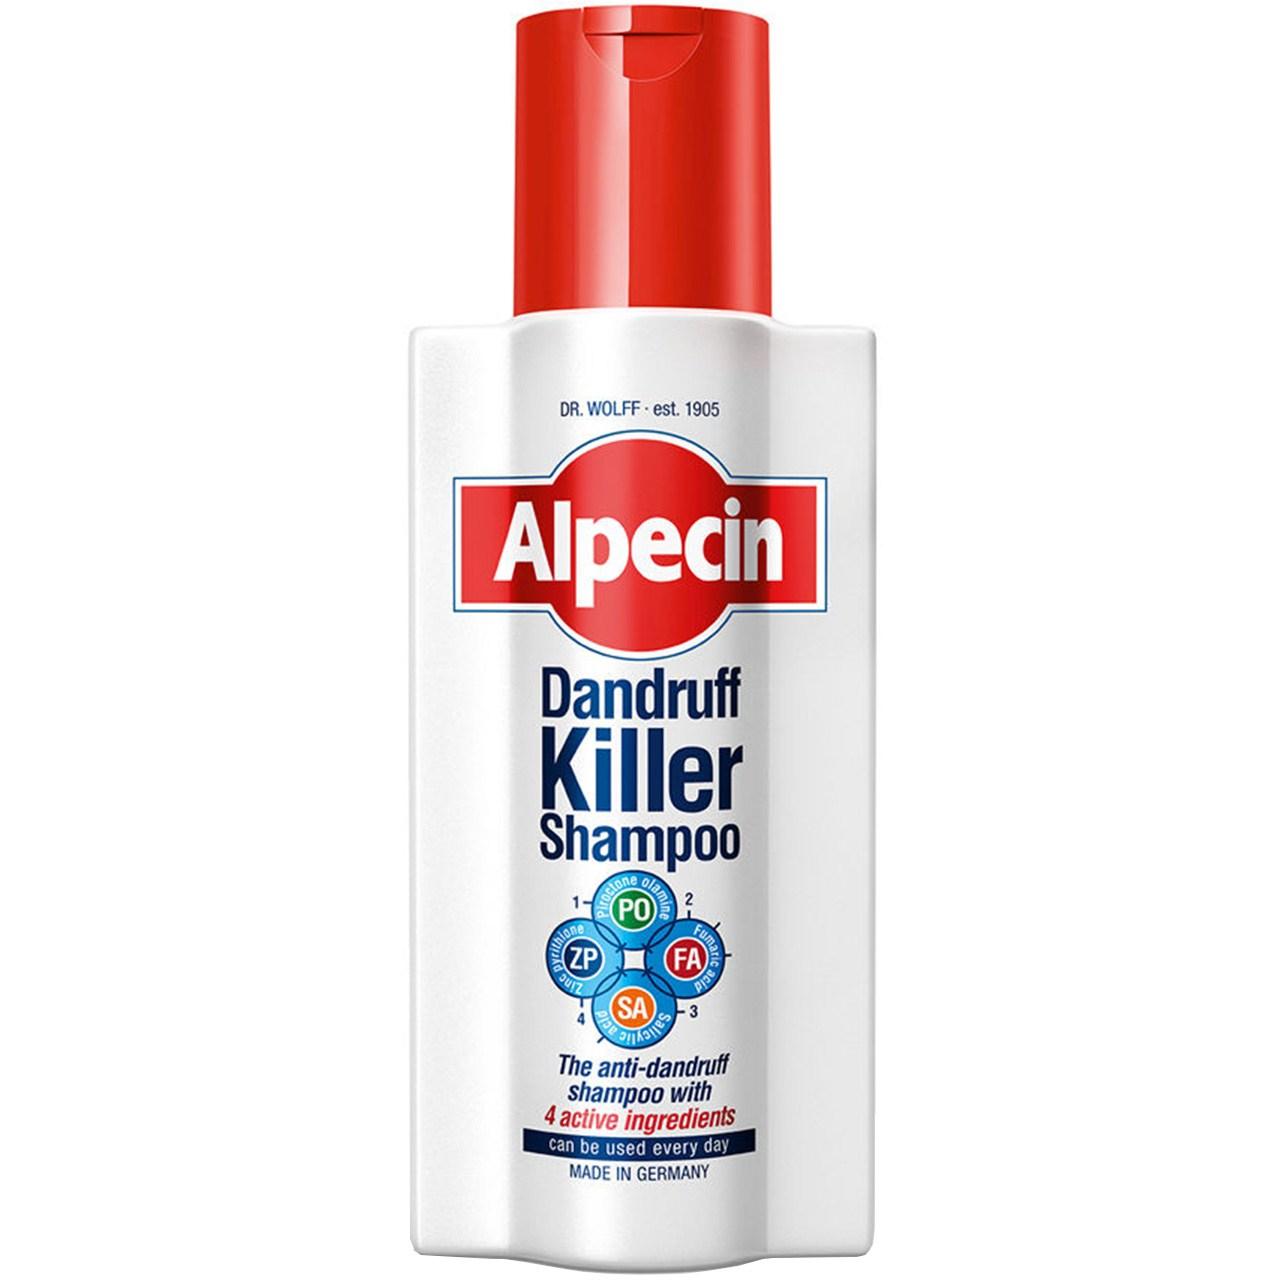 شامپو ضد شوره سر آلپسین مدل Dandruff Killer حجم 250 میلی لیتر